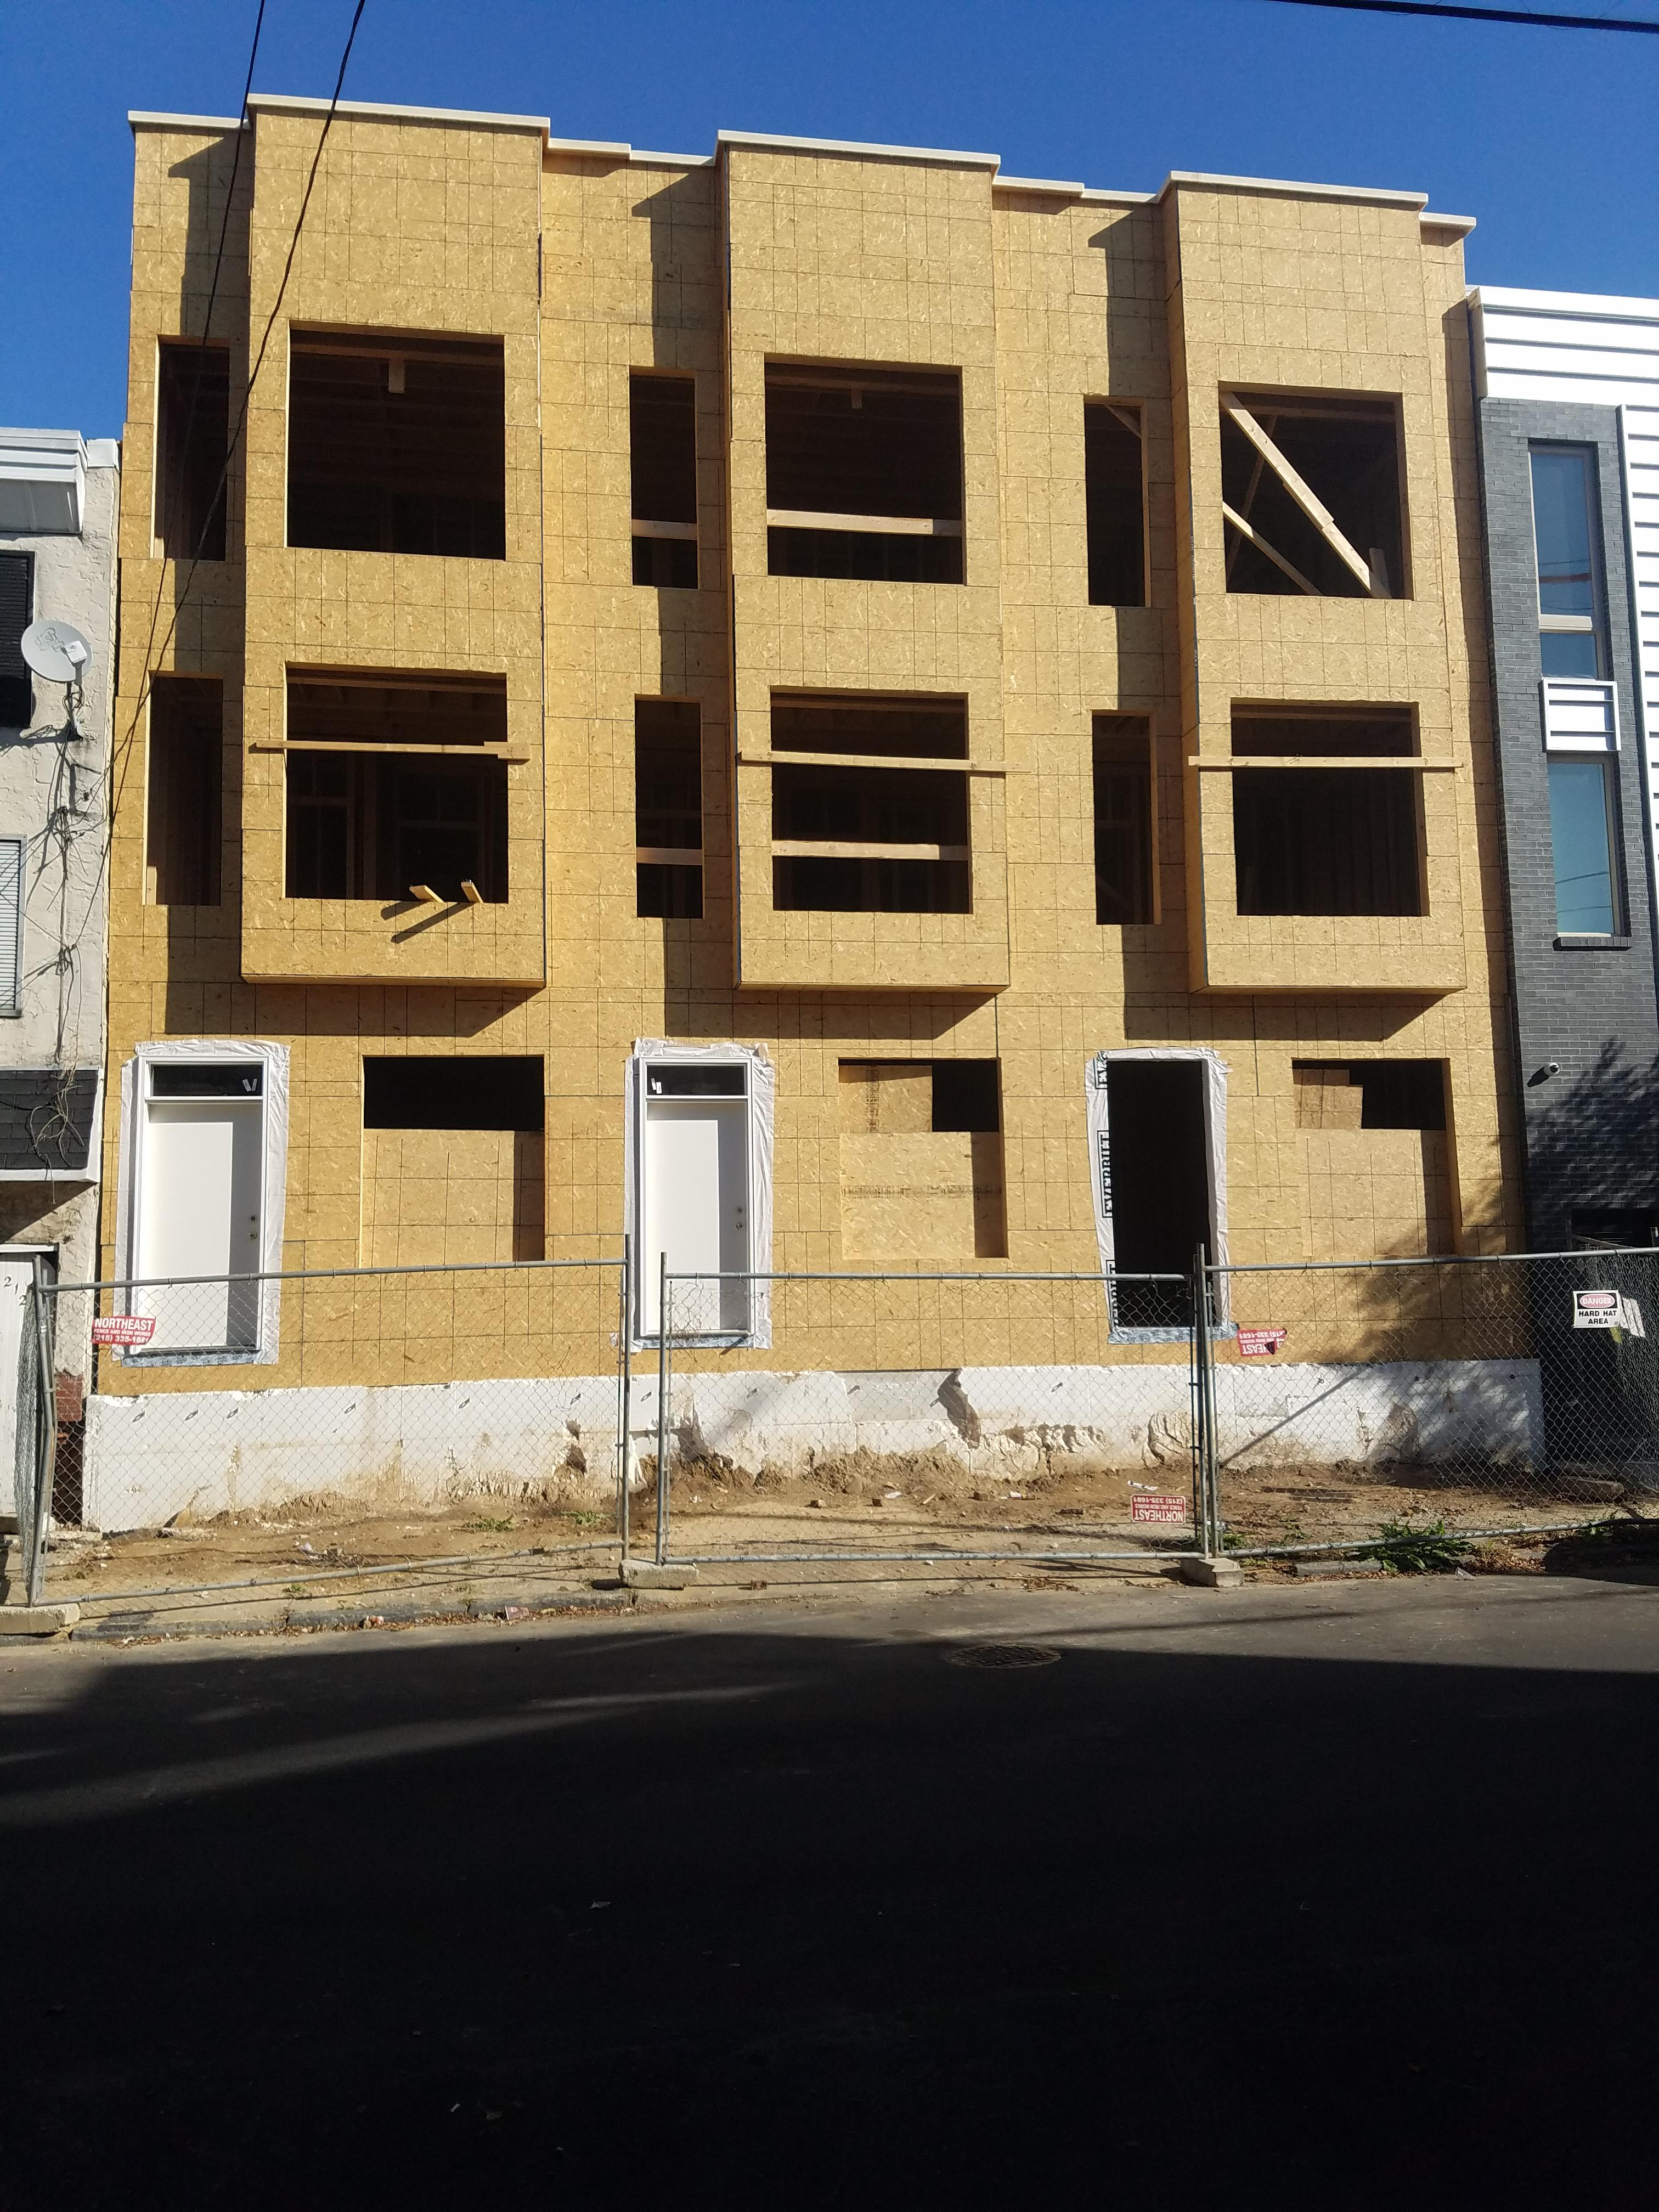 Sergeant Hazzard Construction Photo Architecture.jpg